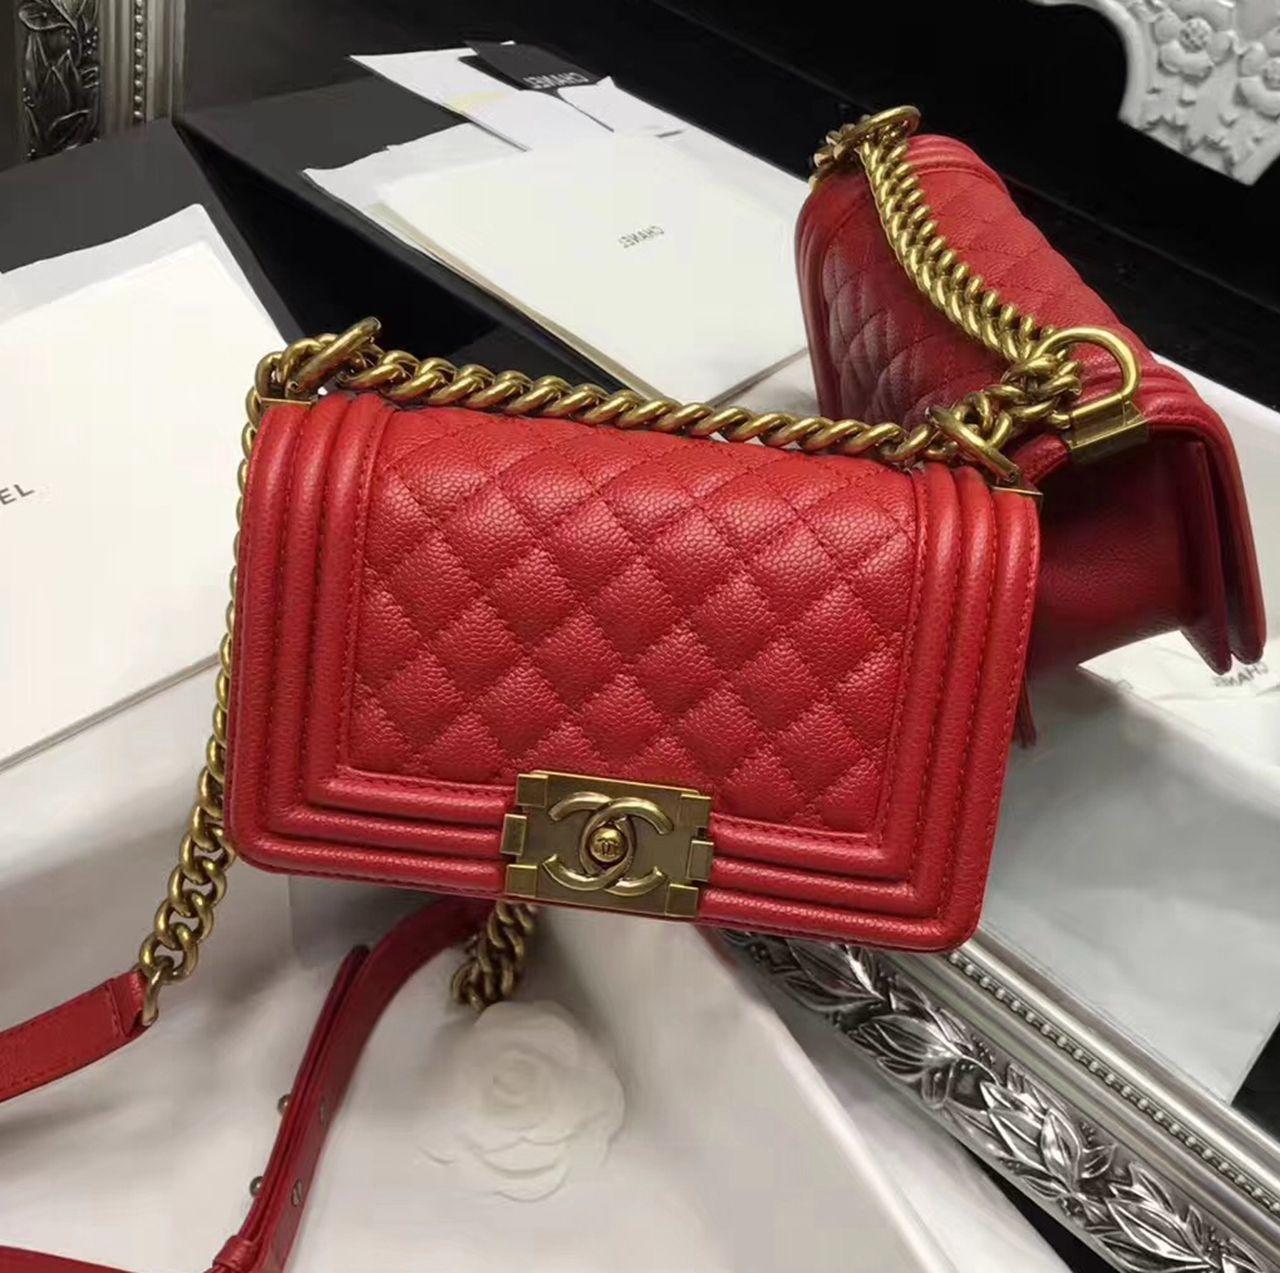 c92d9bcb1c6fdb Chanel Original Caviar Leather Small Le Boy Flap Bag in Red 20cm ...